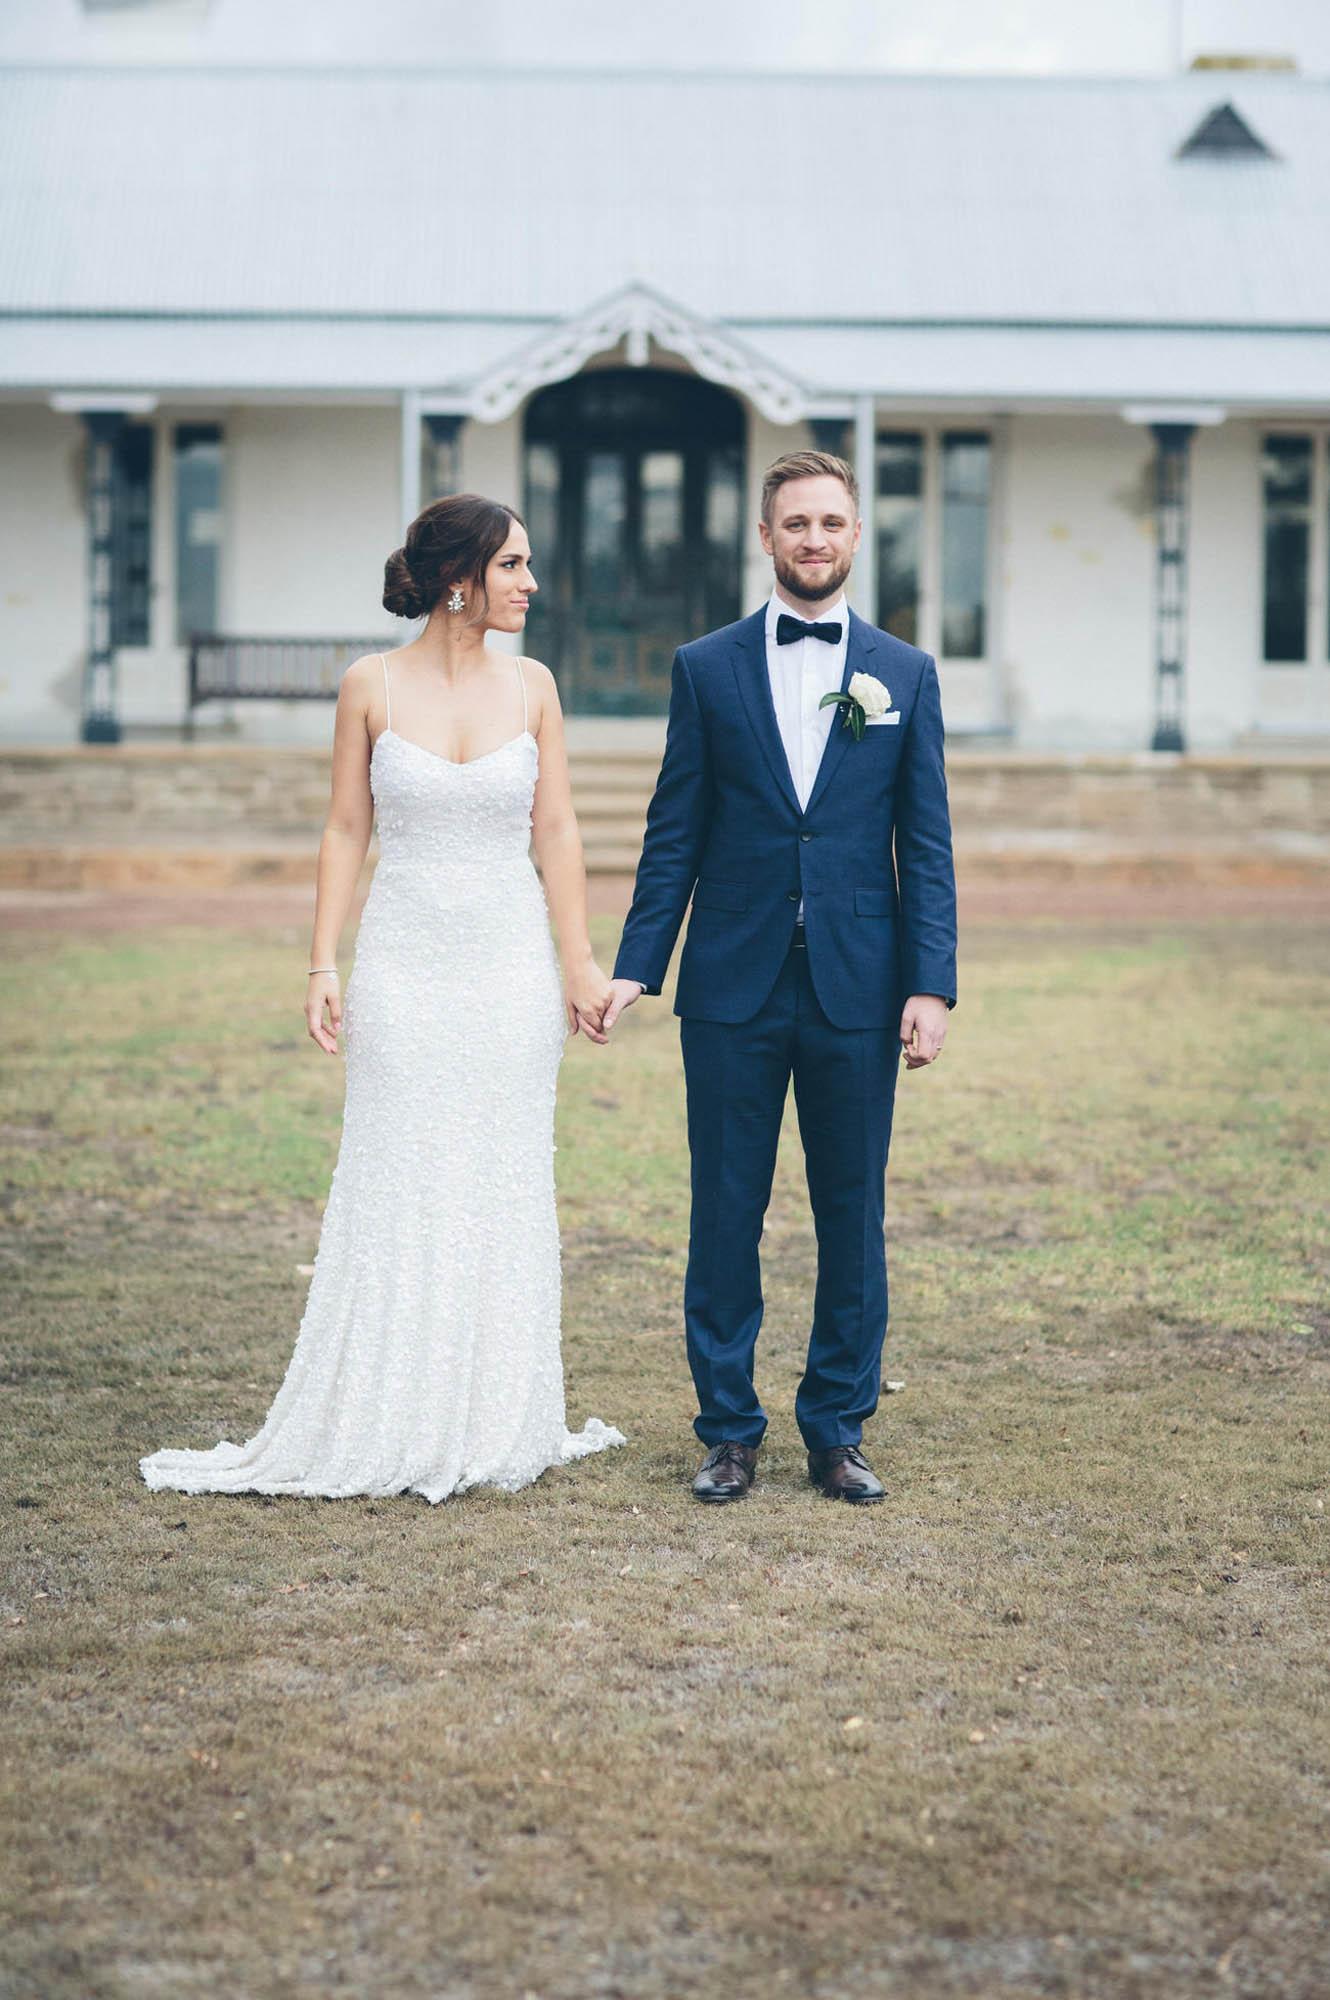 MacDougall-Photography-Sydney-Wedding-Photographers-52.jpg